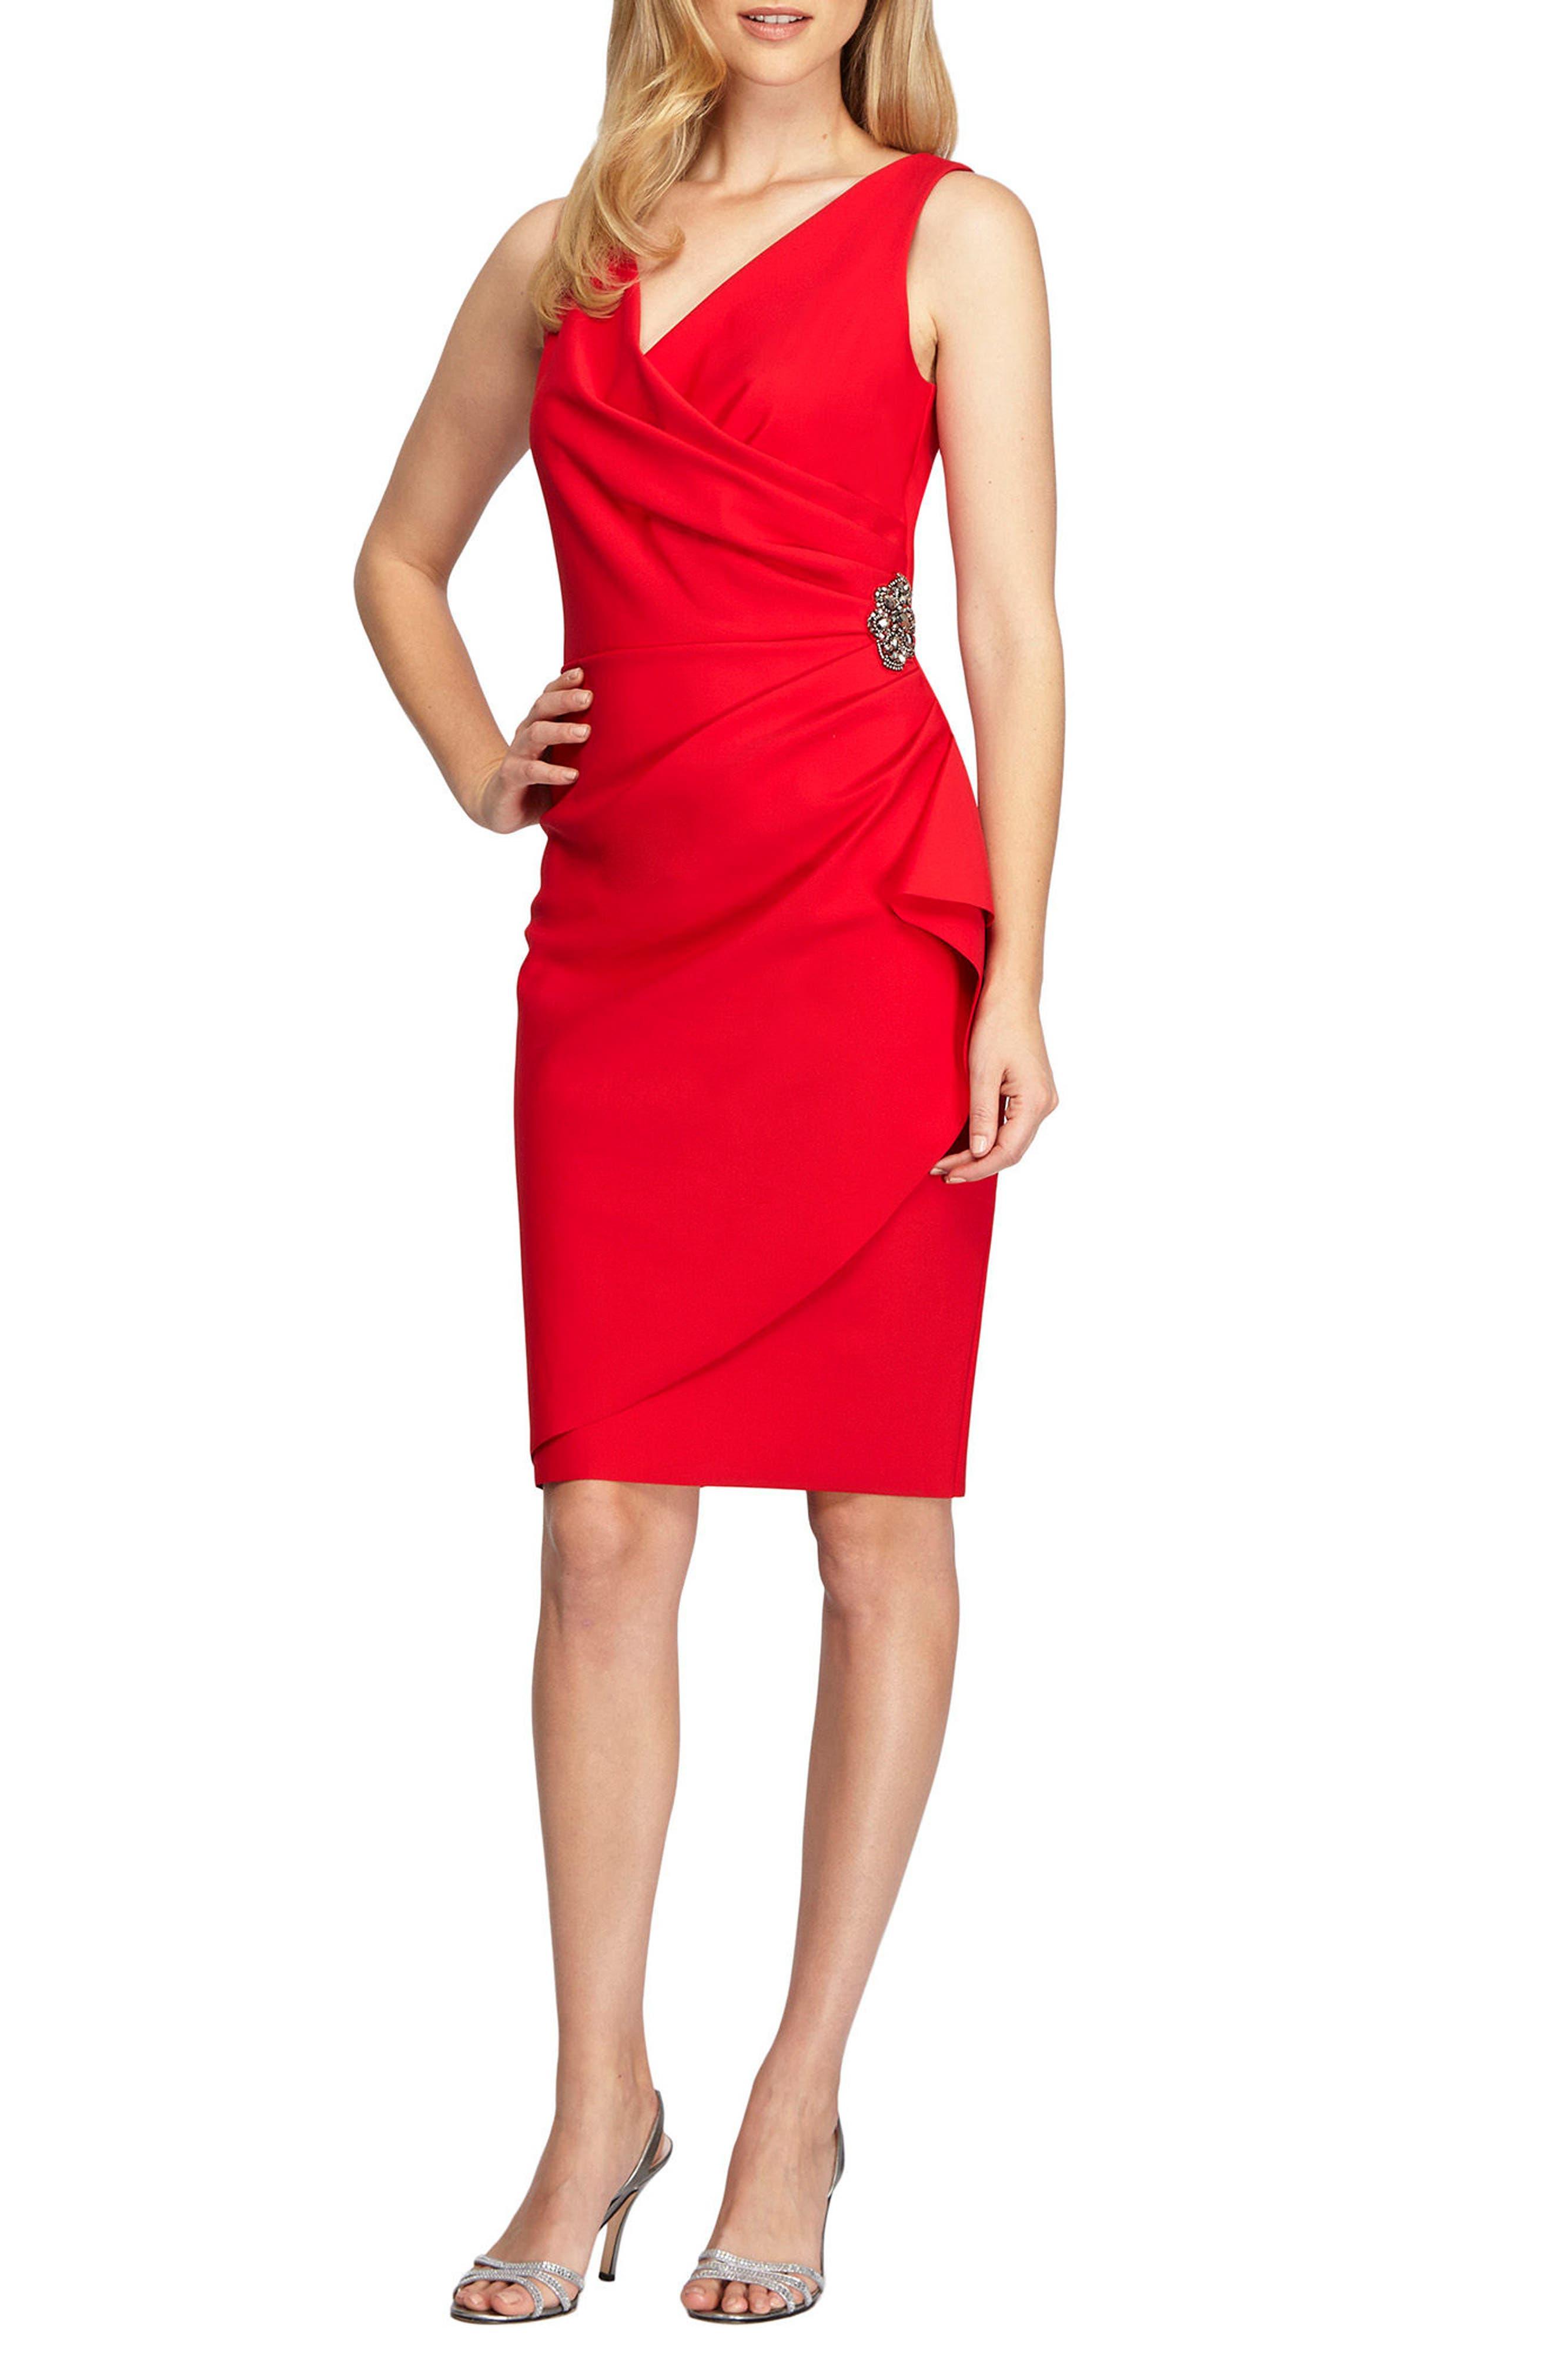 Alternate Image 1 Selected - Alex Evenings Side Ruched Dress (Regular & Petite)